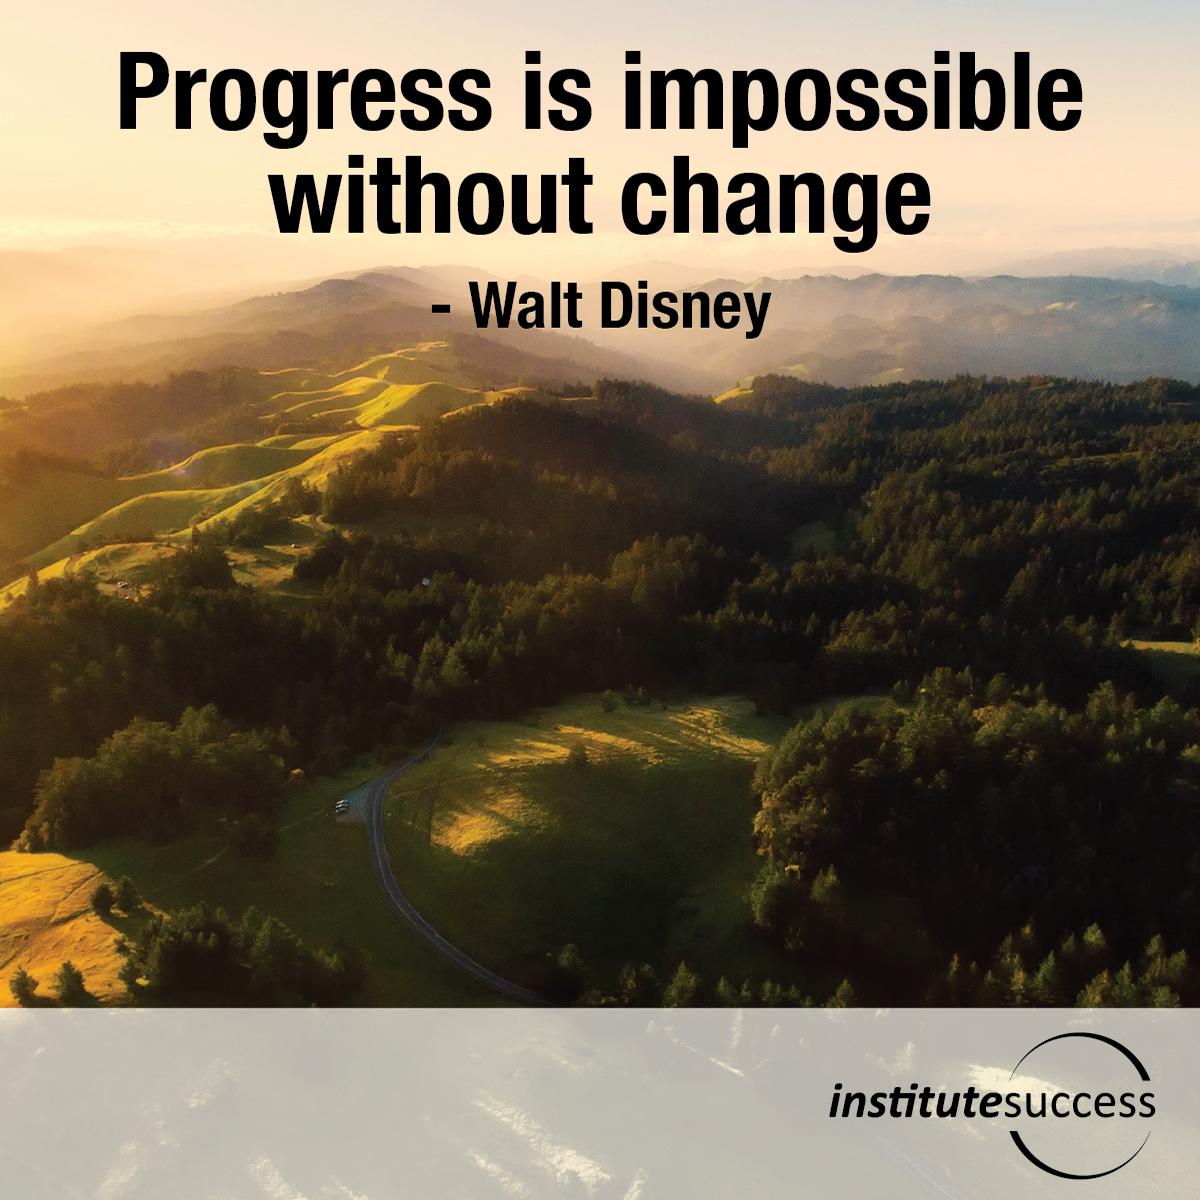 Progress is impossible without change – Walt Disney